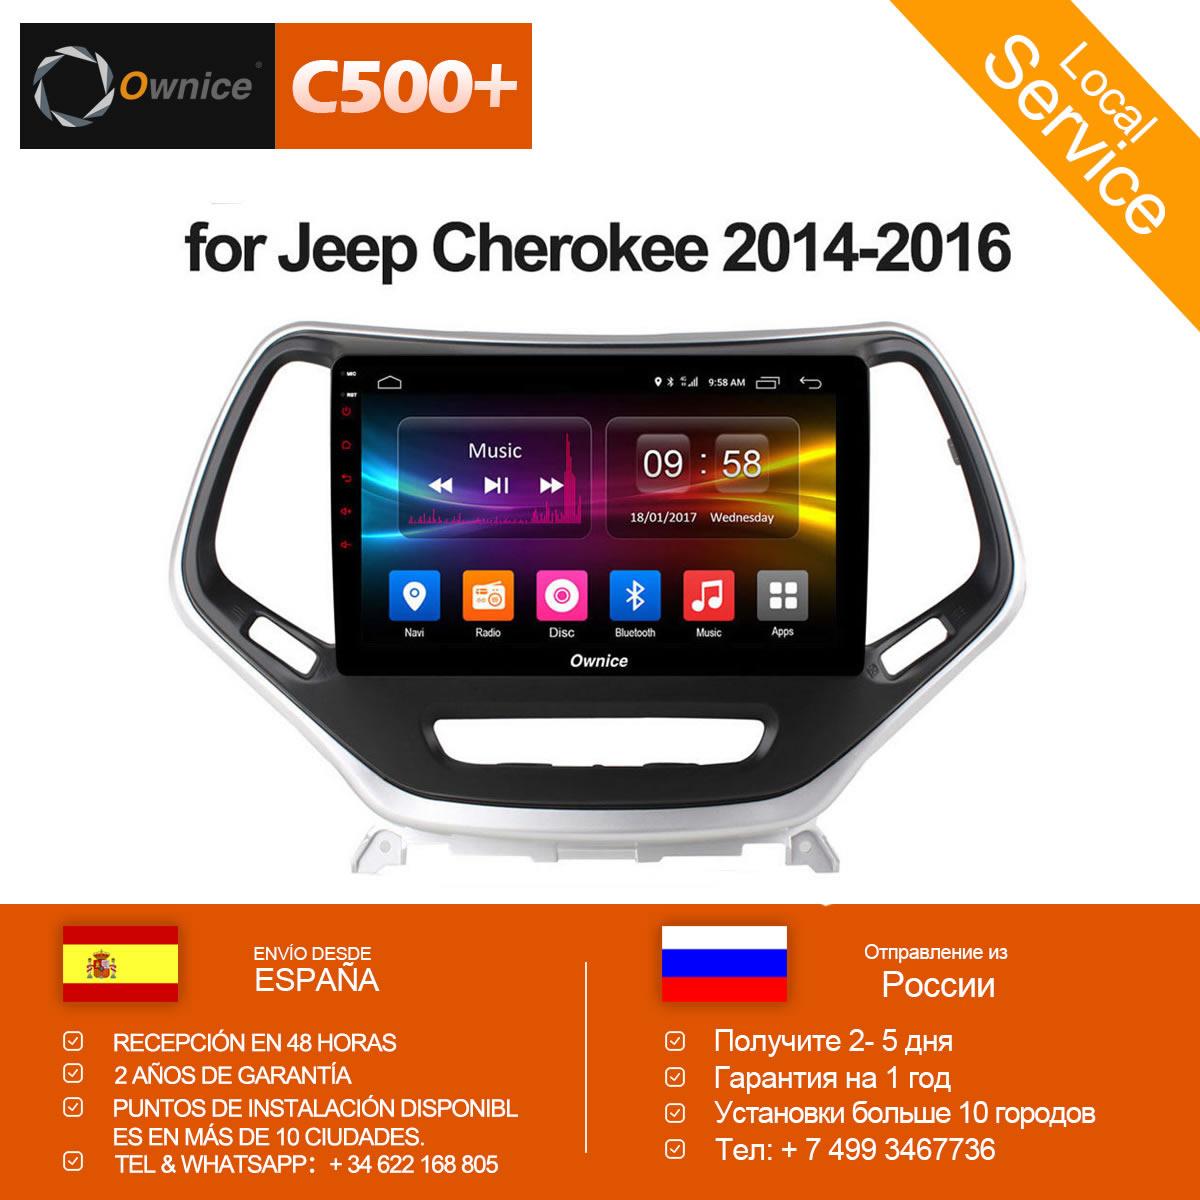 Ownice C500 + G10 10,2 дюймов Octa 8 ядра Android 8,1 автомобилей Радио для Jeep Cherokee 2014 2016 стерео аудио Автомобильная электроника